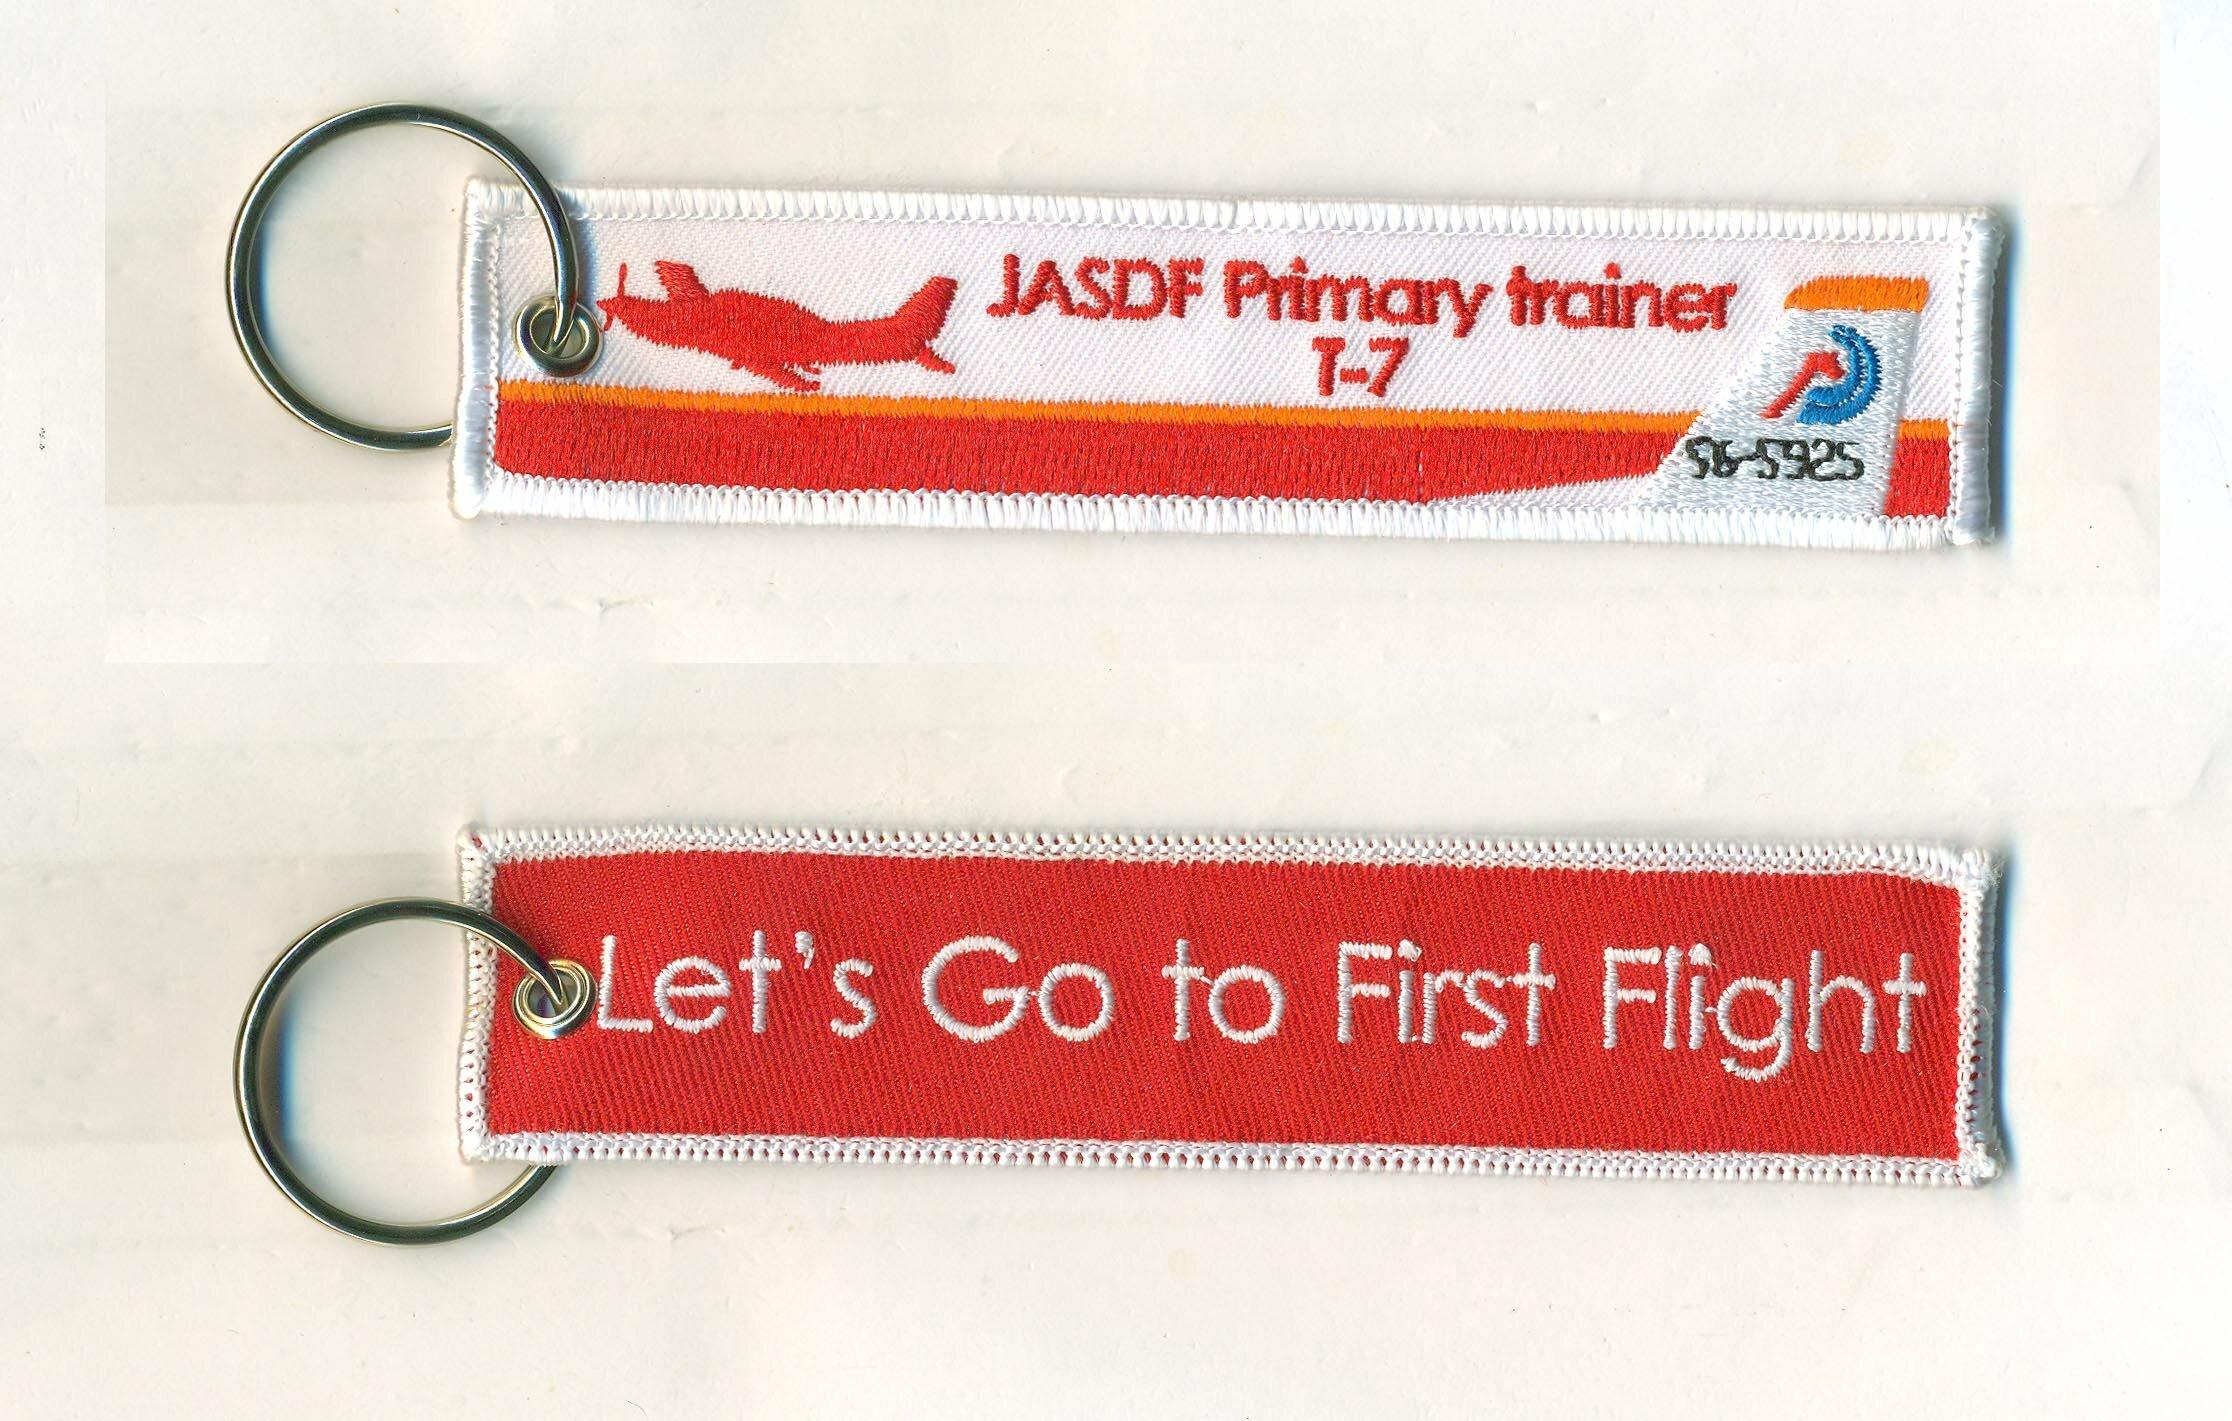 Let's GO to Fast Flightキーホルダー/JASDF T-7